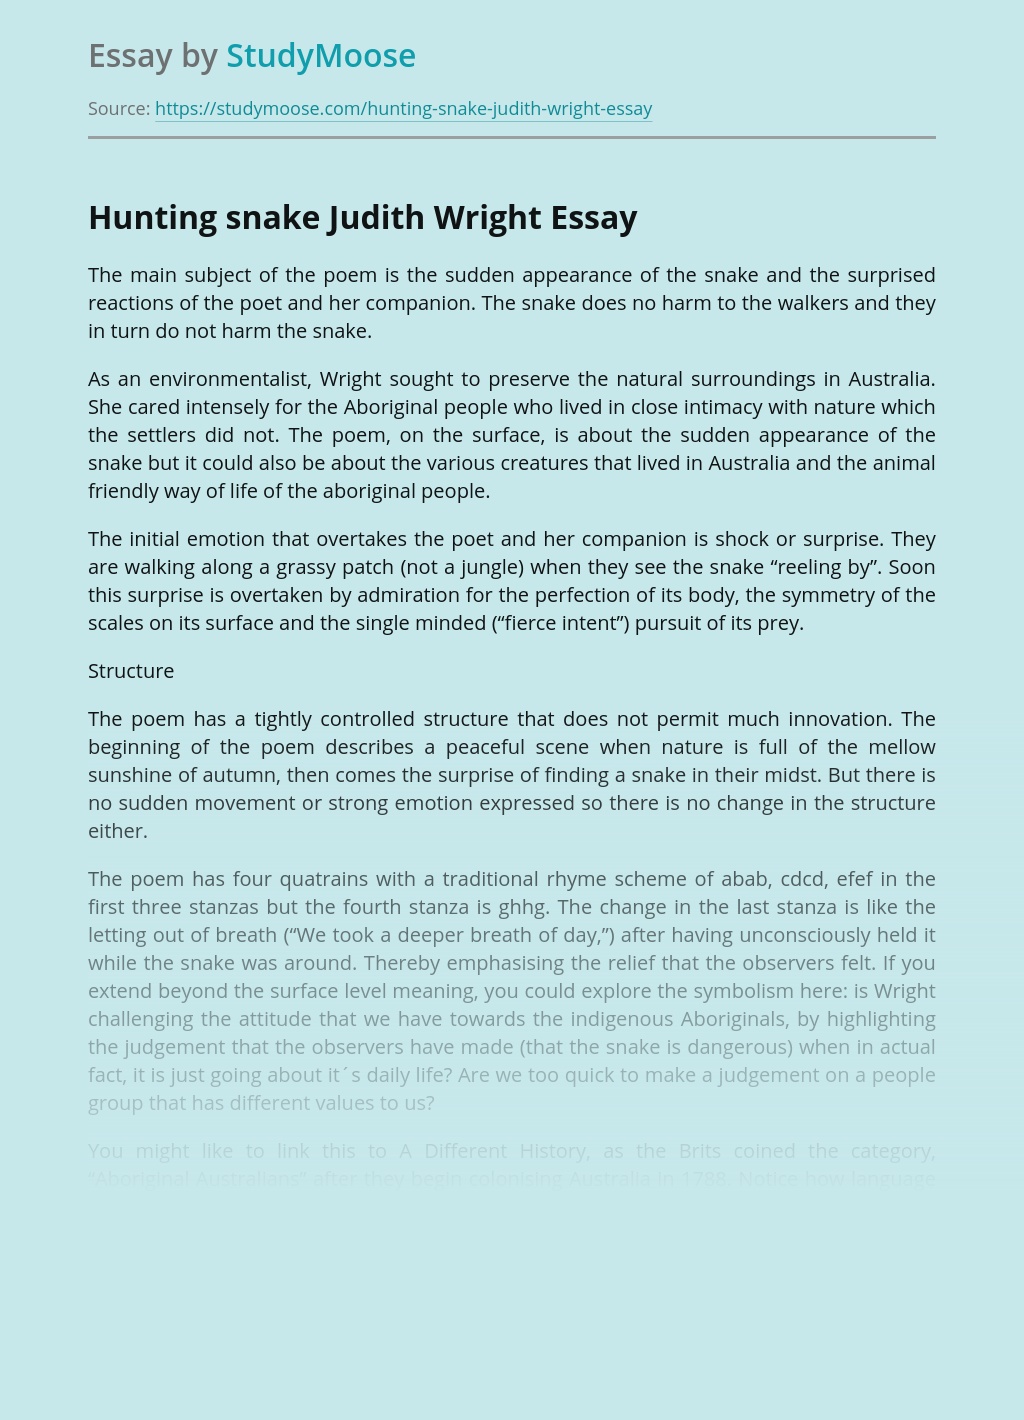 Hunting snake Judith Wright